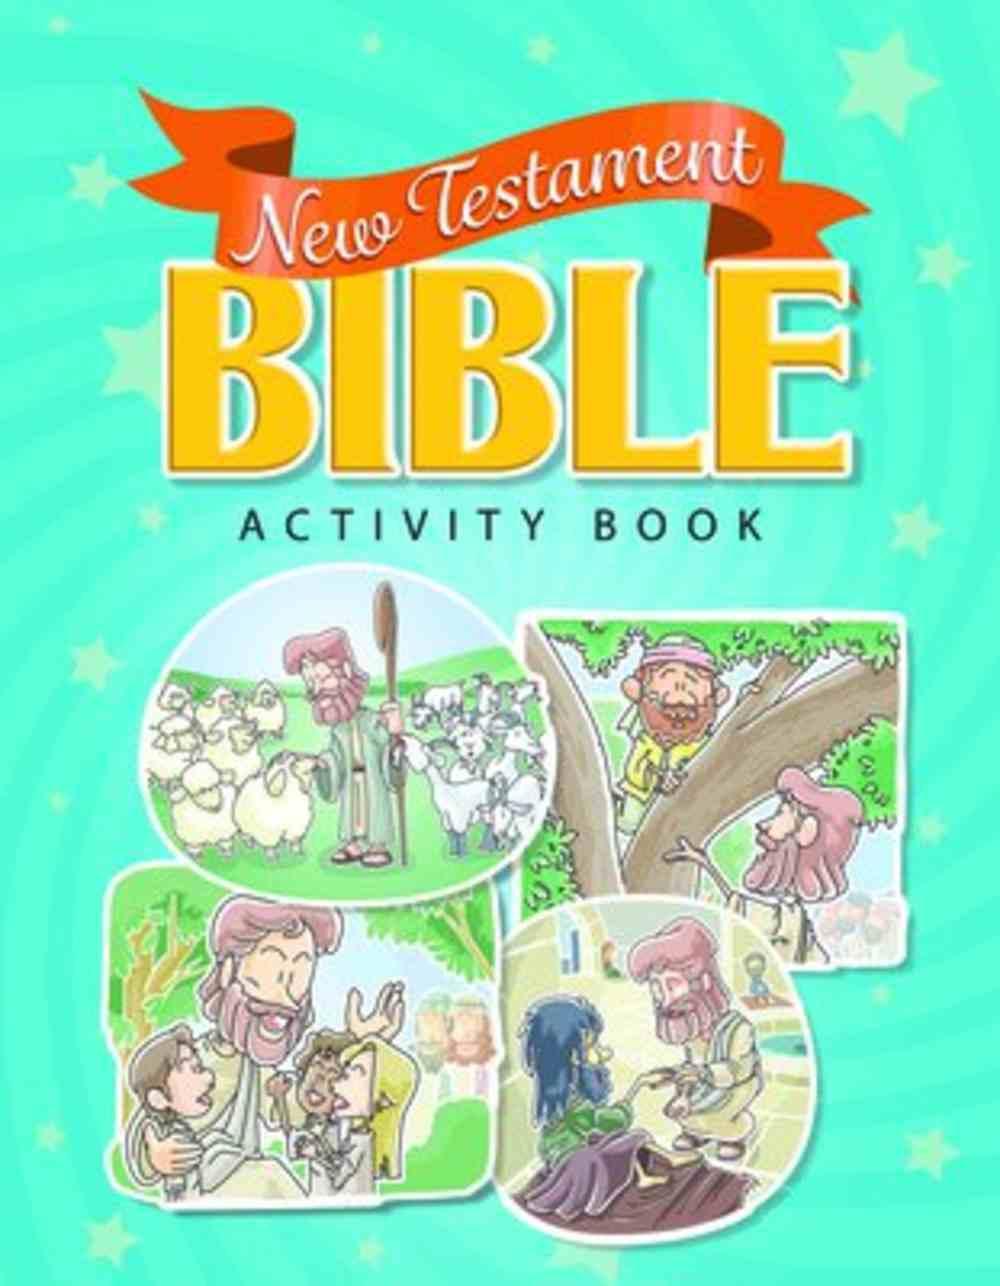 New Testament Bible Activity Book (Reproducible) Paperback